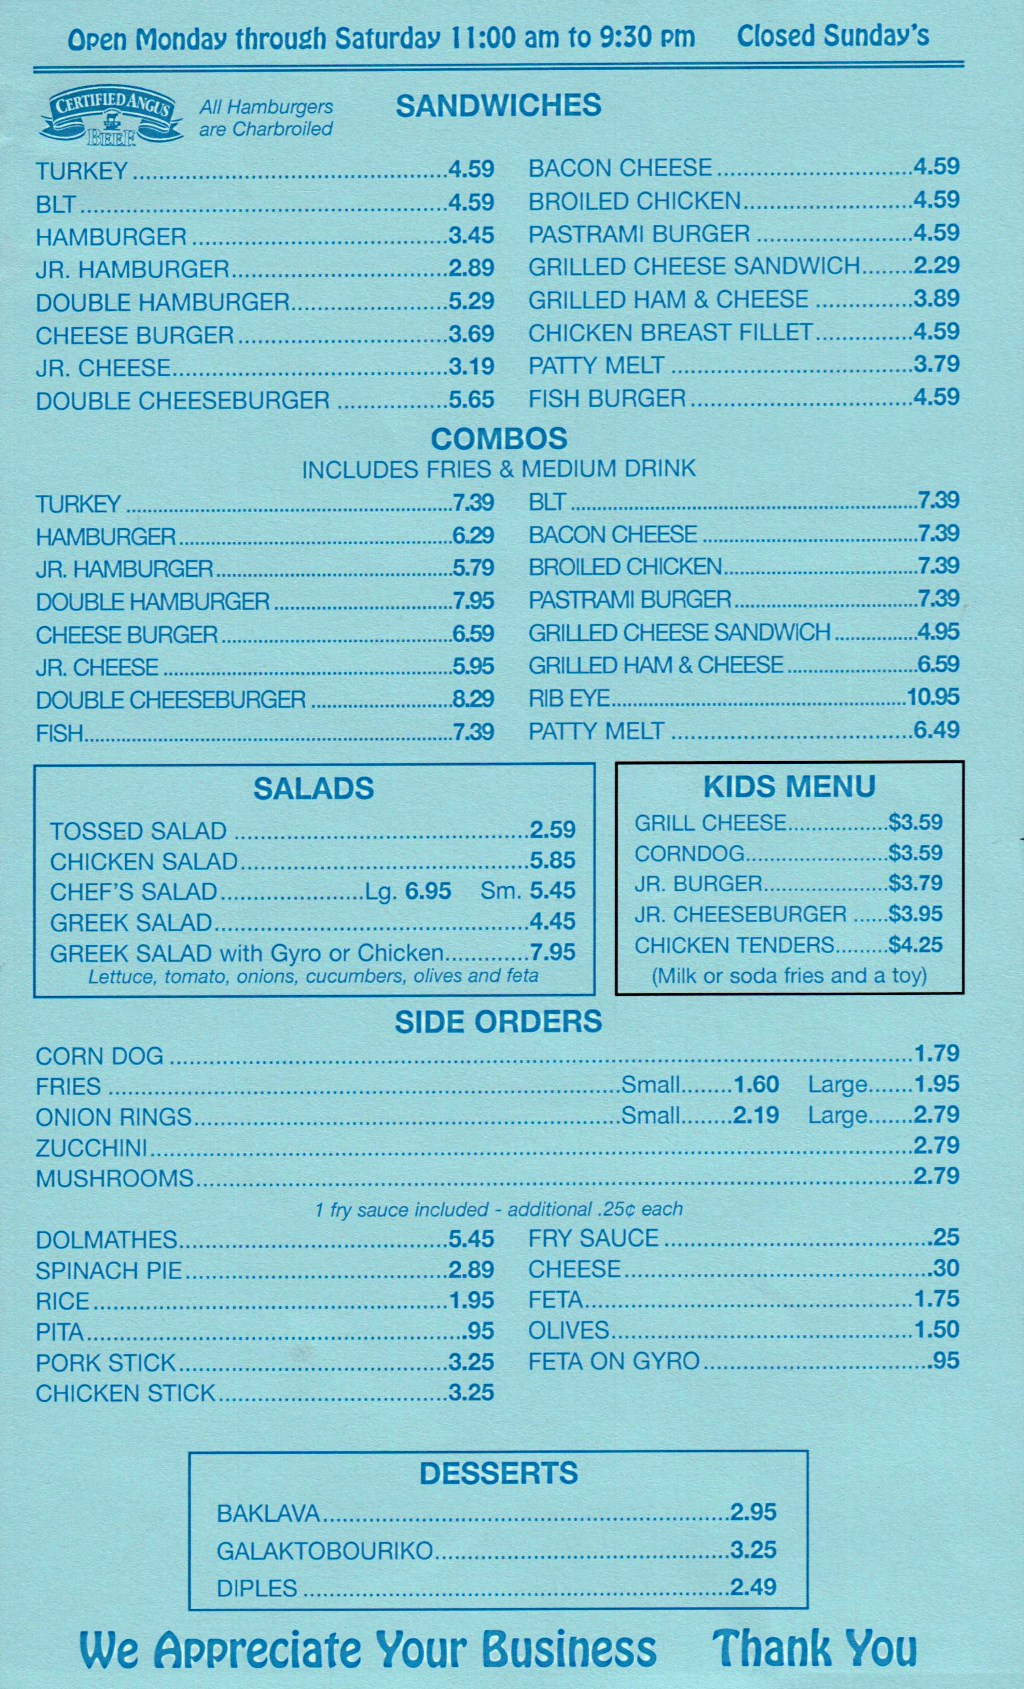 Yanni's Greek Express menu - sandwiches, combos, salads, sides